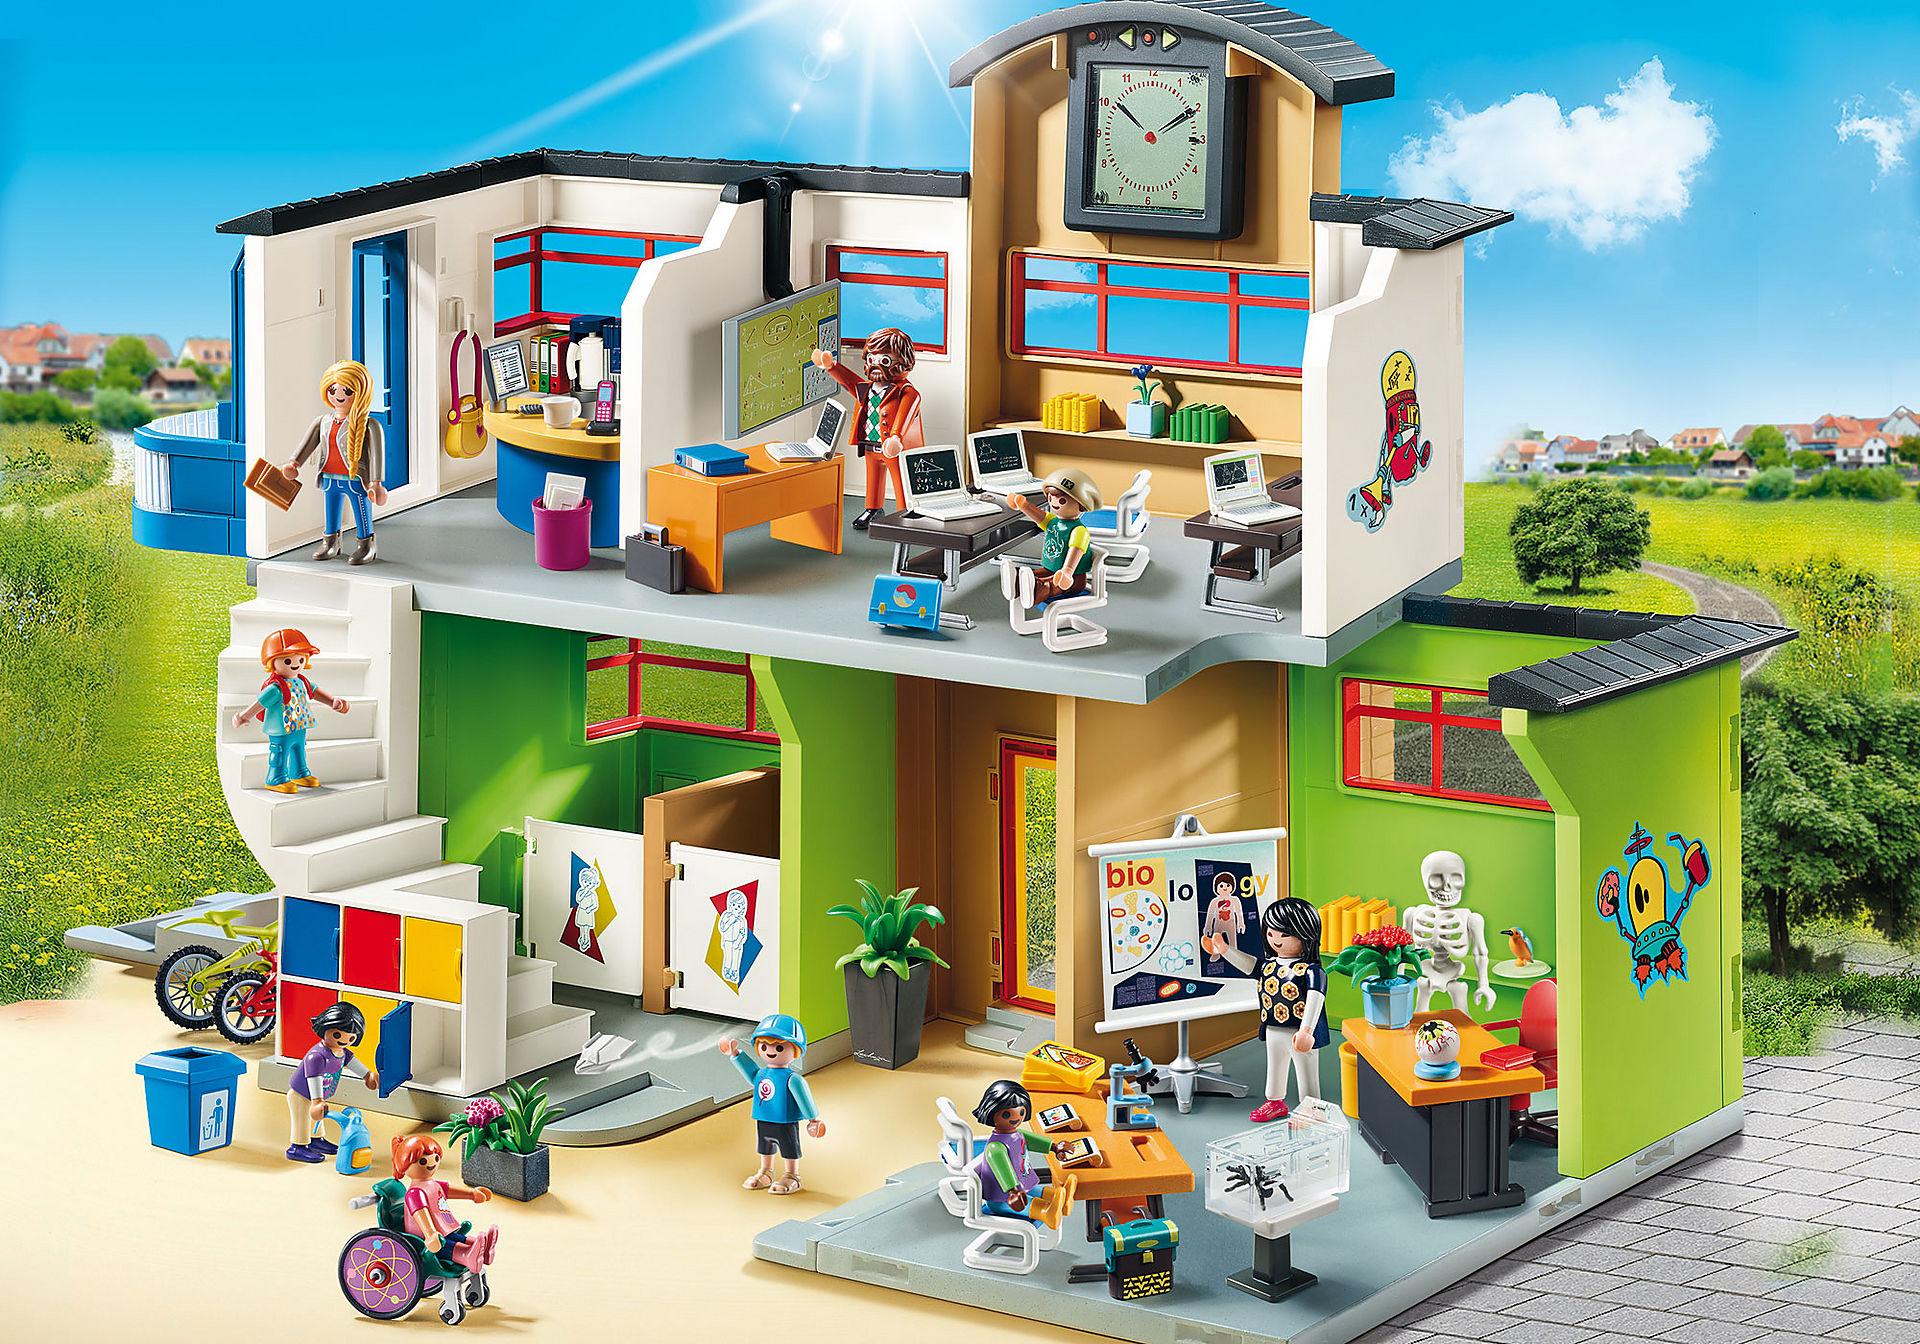 http://media.playmobil.com/i/playmobil/9453_product_detail/Große Schule mit Einrichtung